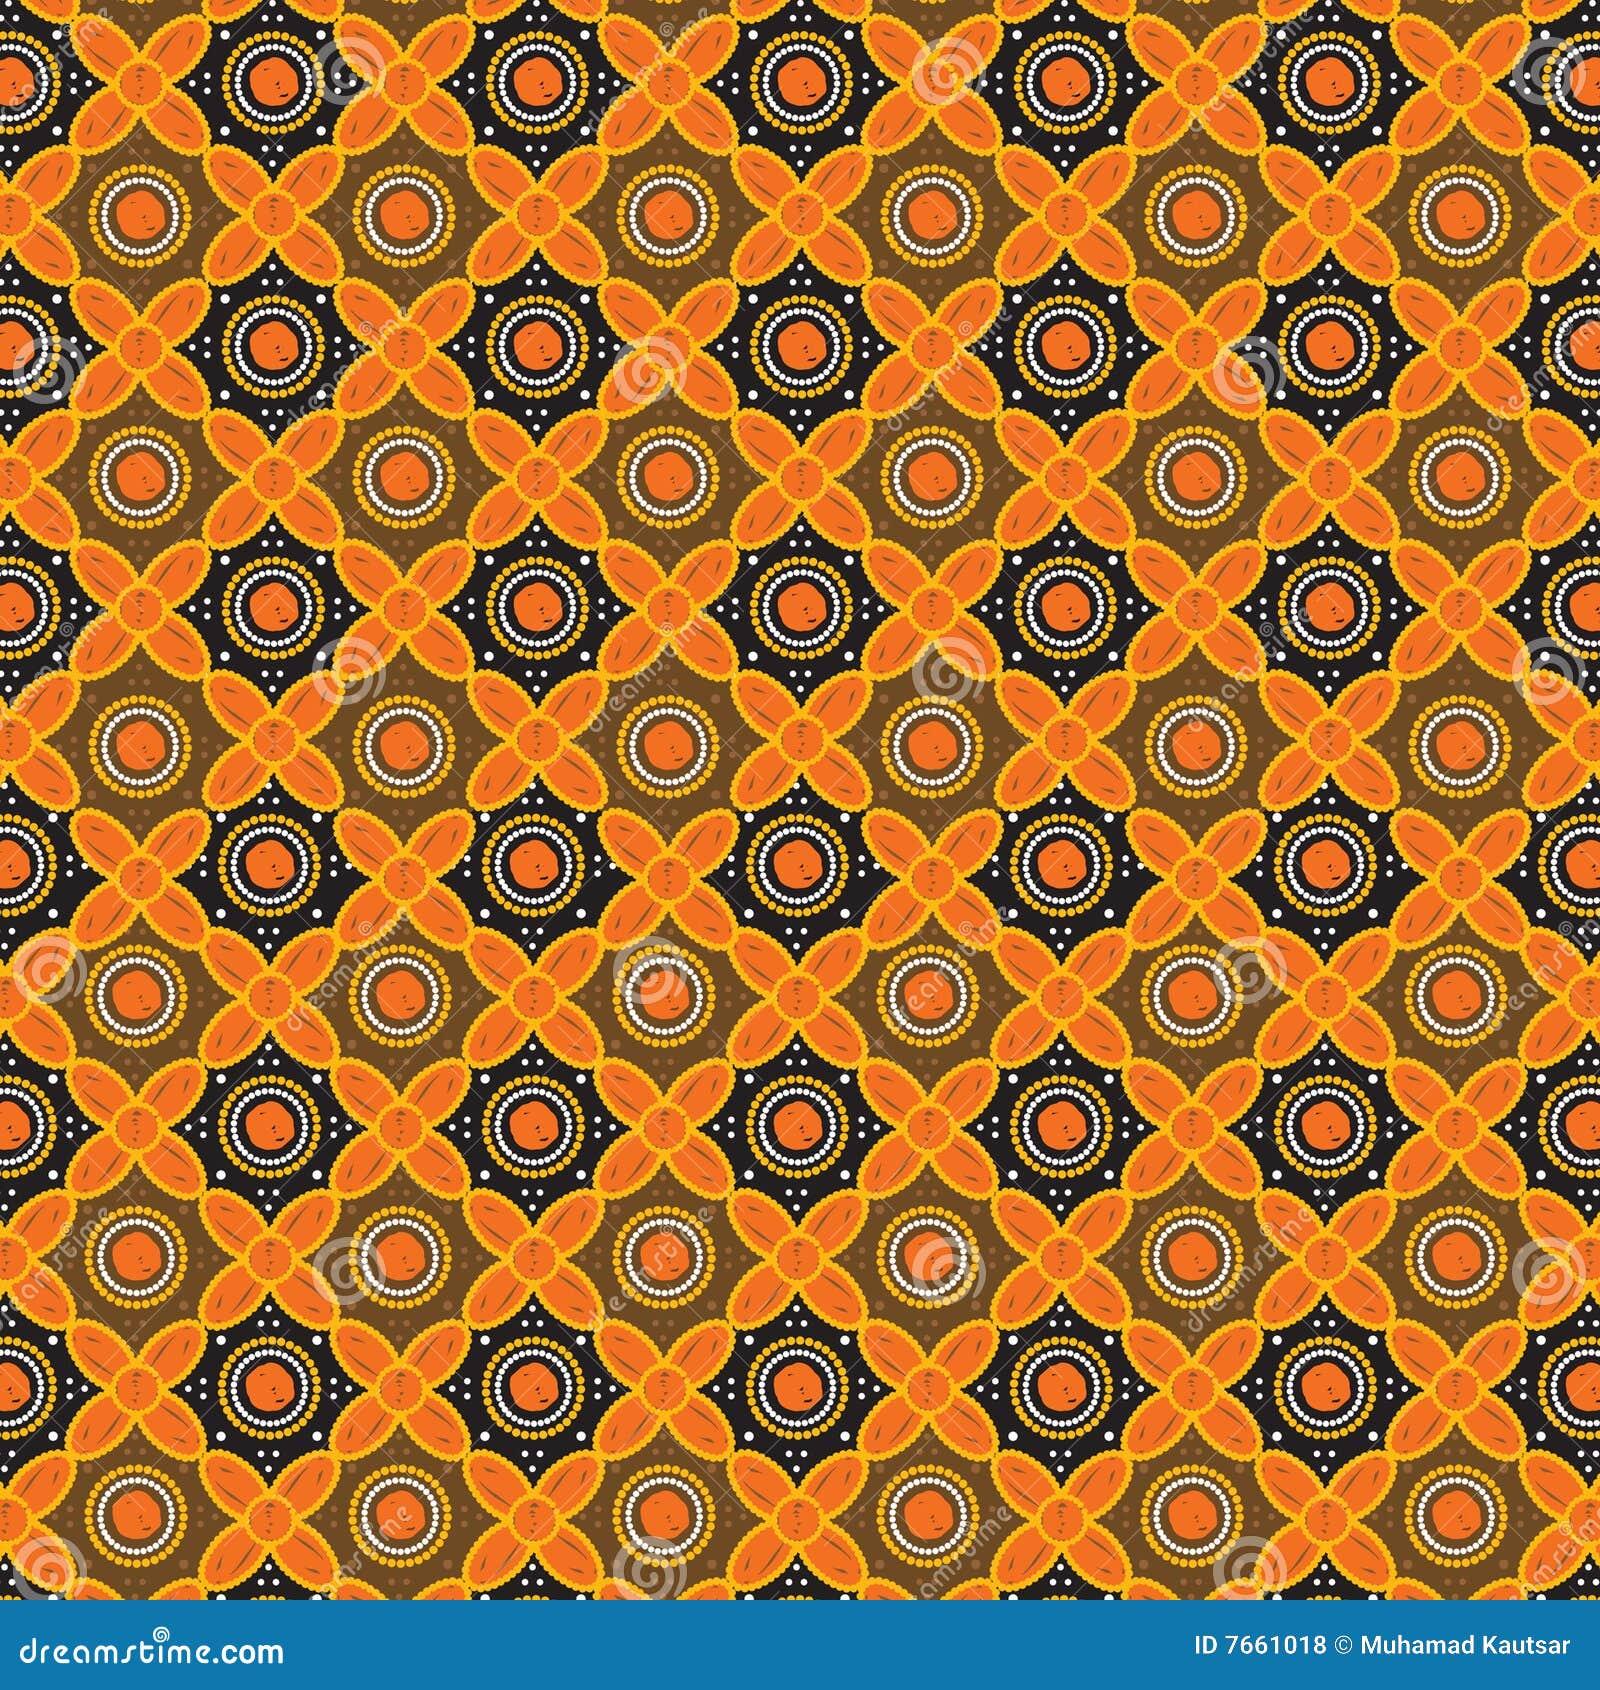 Batik Pattern Background In Vector Royalty Free Stock